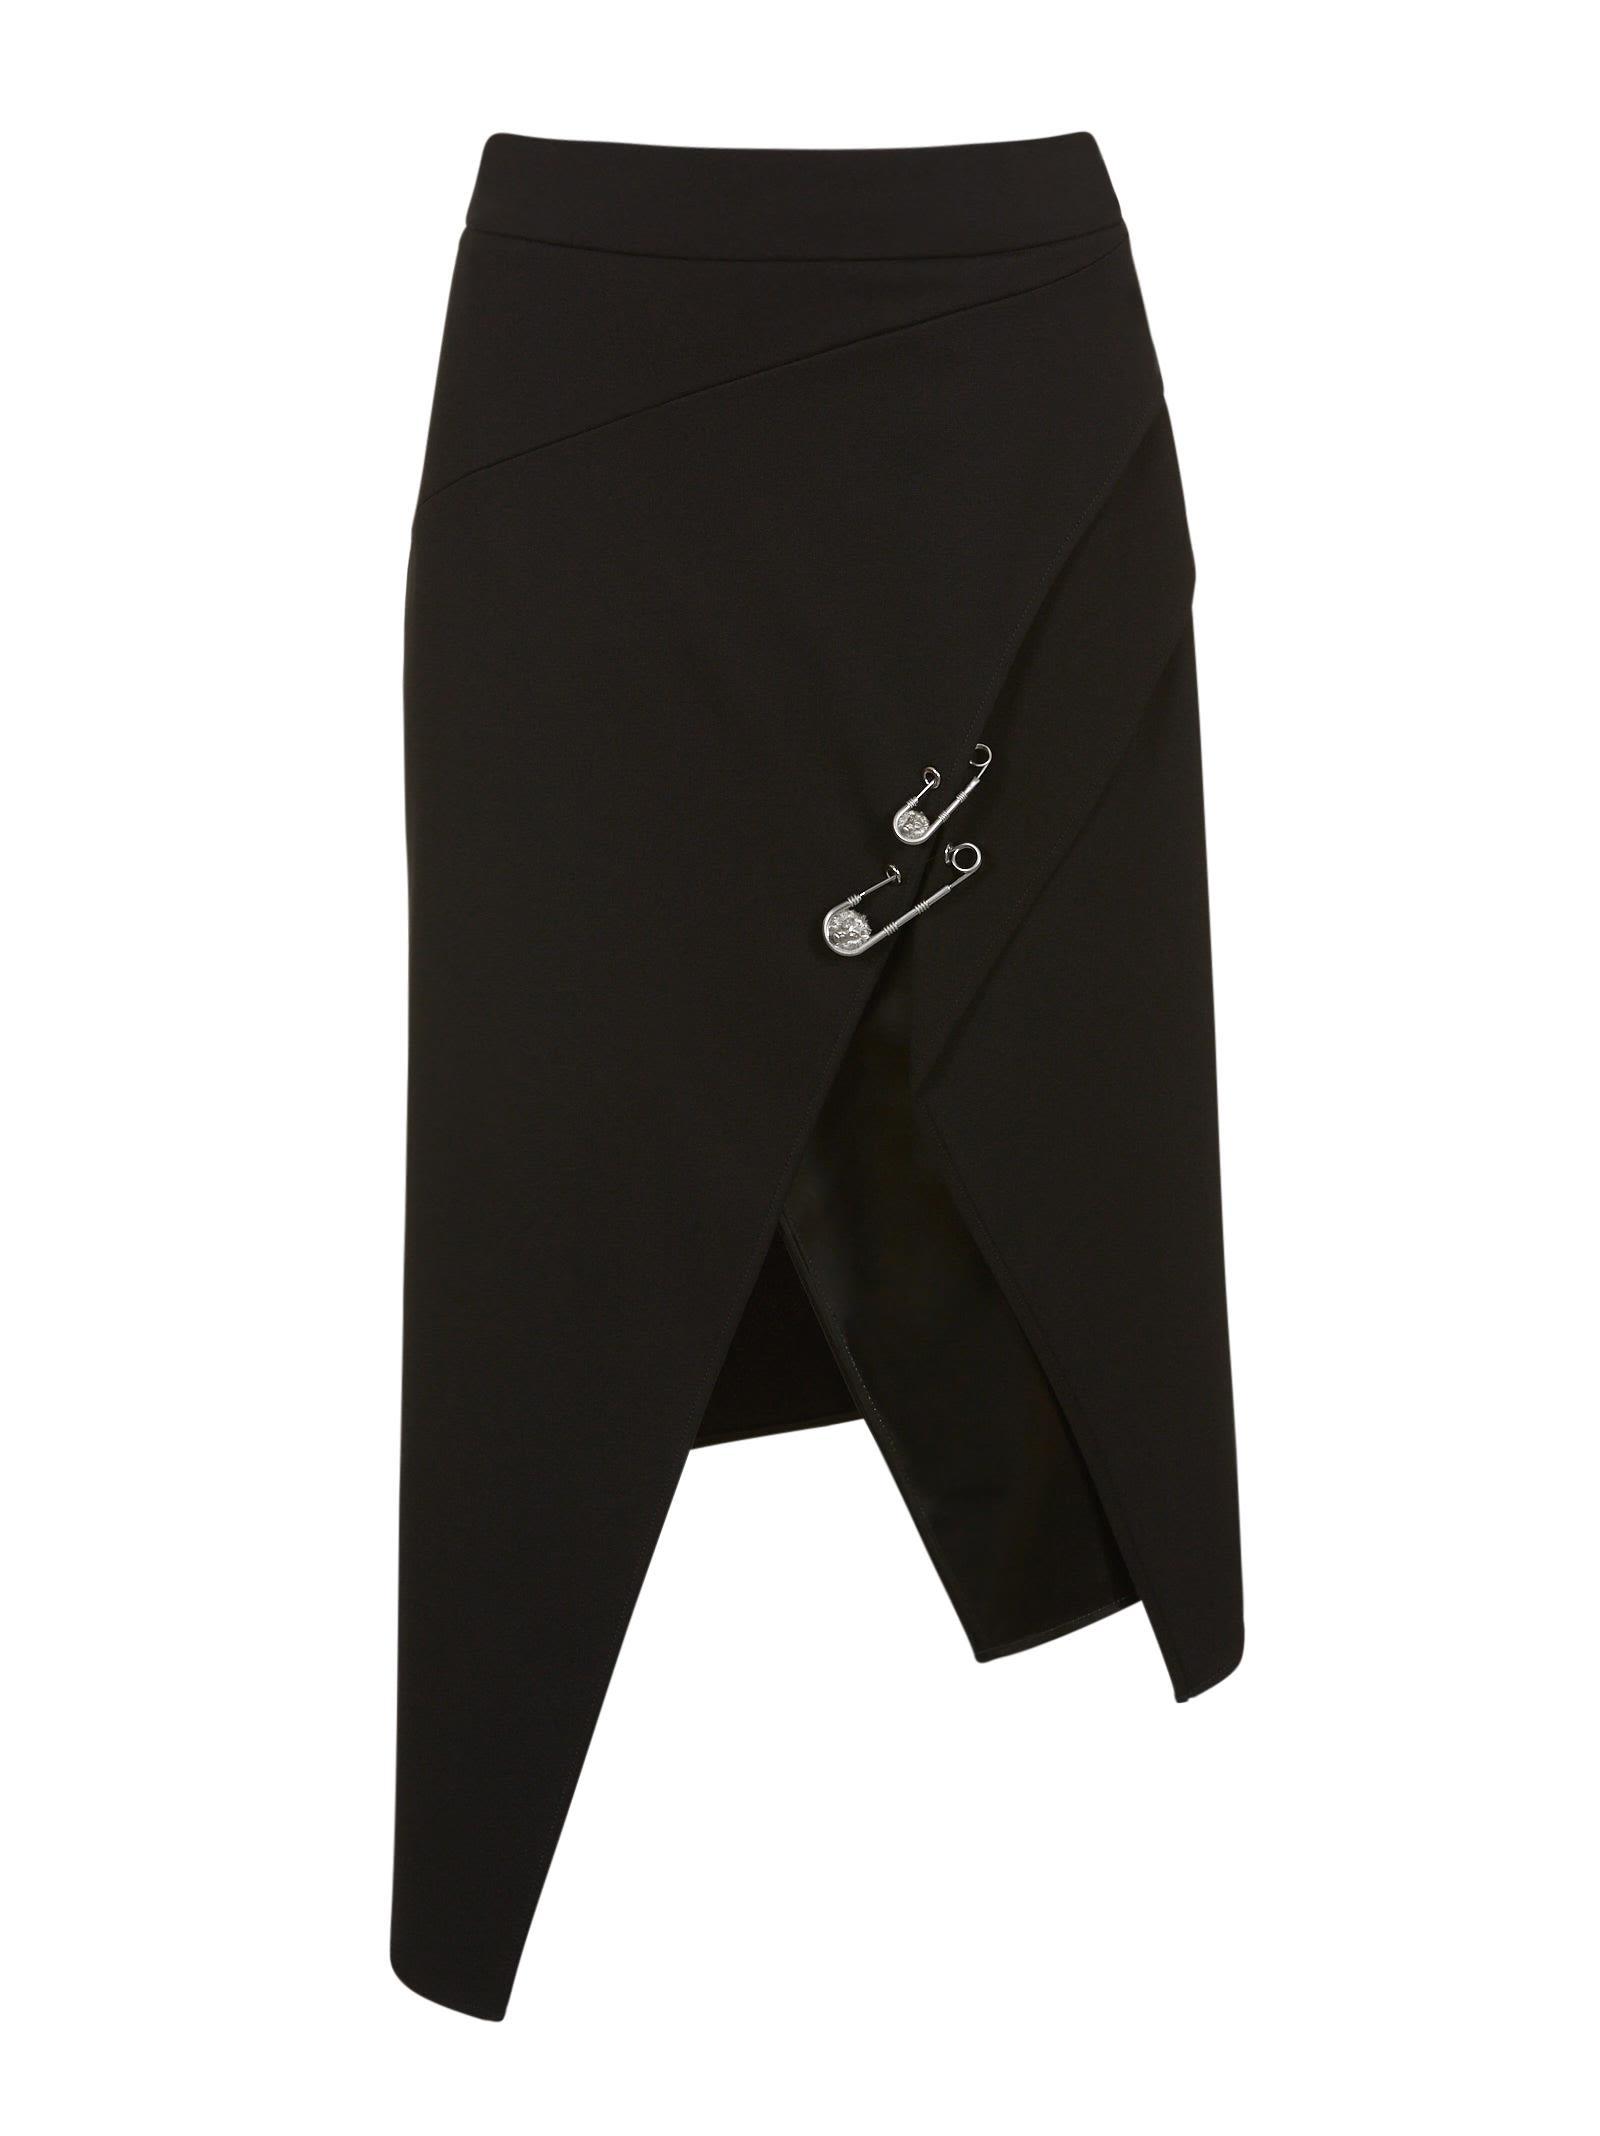 Versus Asymmetric Wrap Skirt